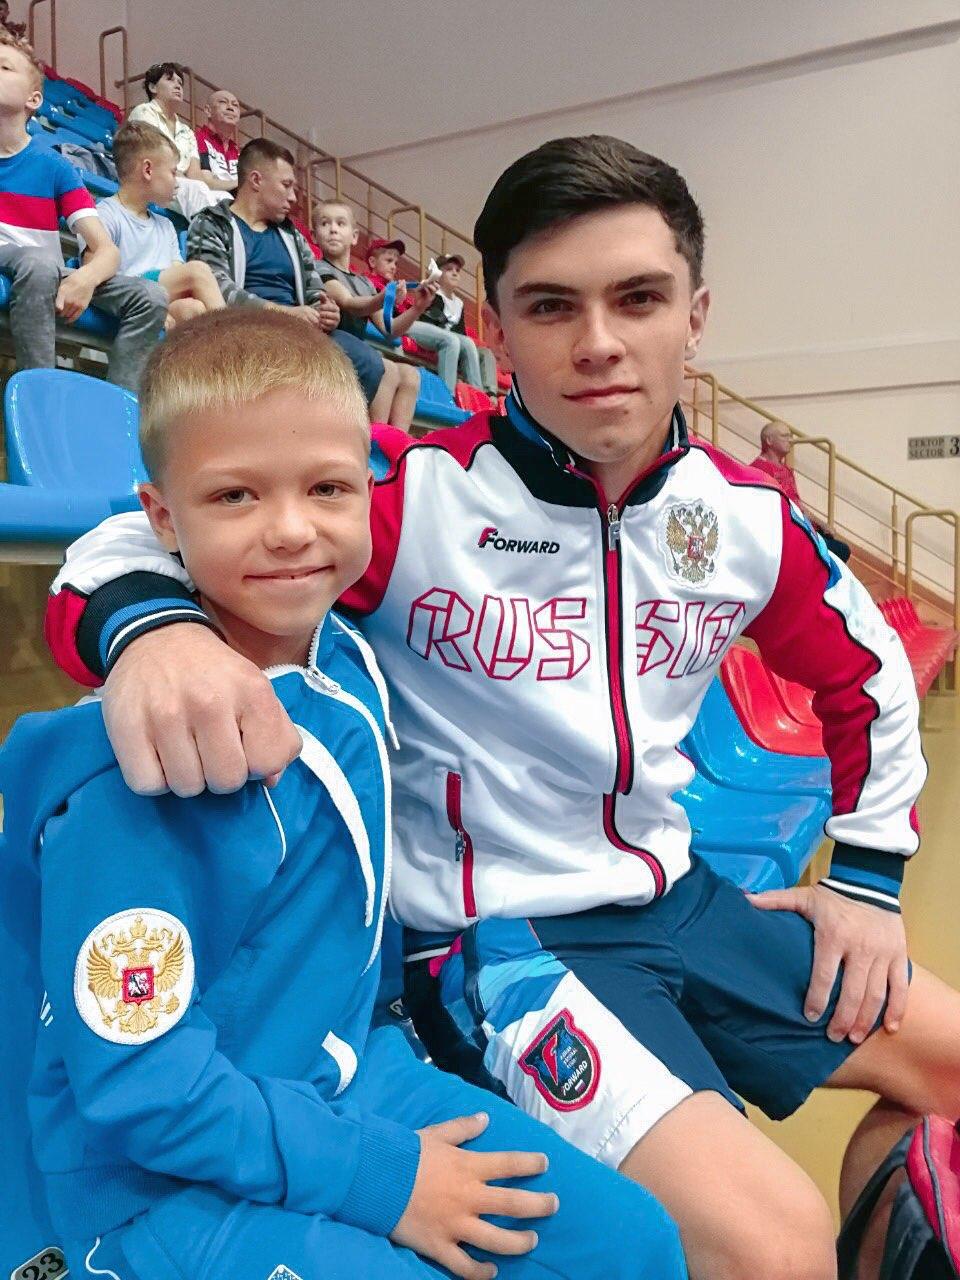 Кумир Семёна — трёхкратный чемпион мира по гимнастике Артур Далалоян